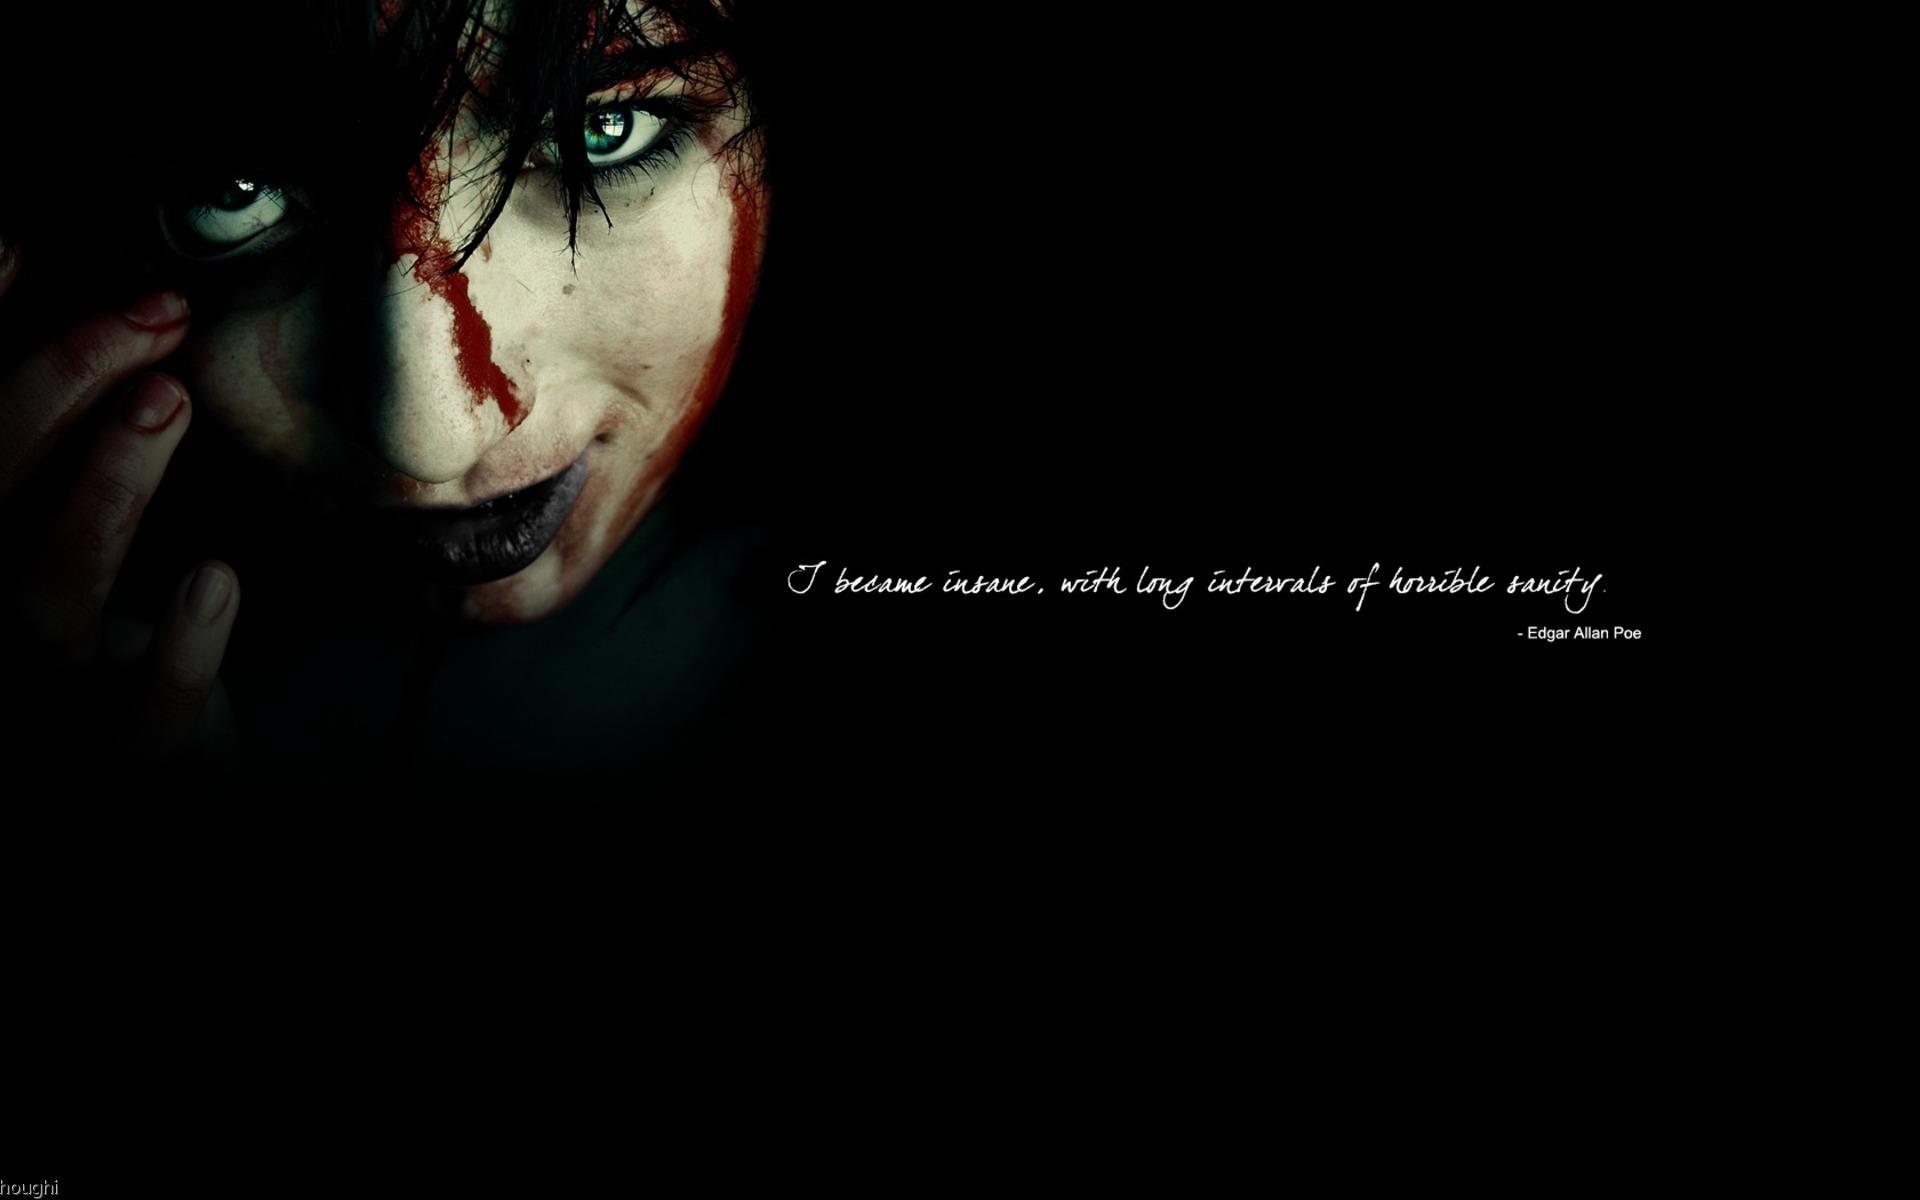 Edgar Allan Poe's quote #4